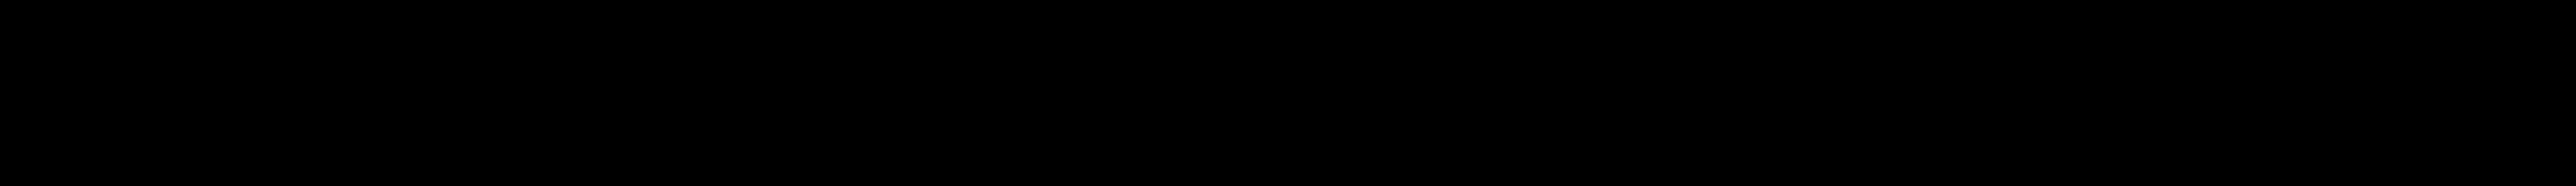 Psychatronic TC Bold Oblique